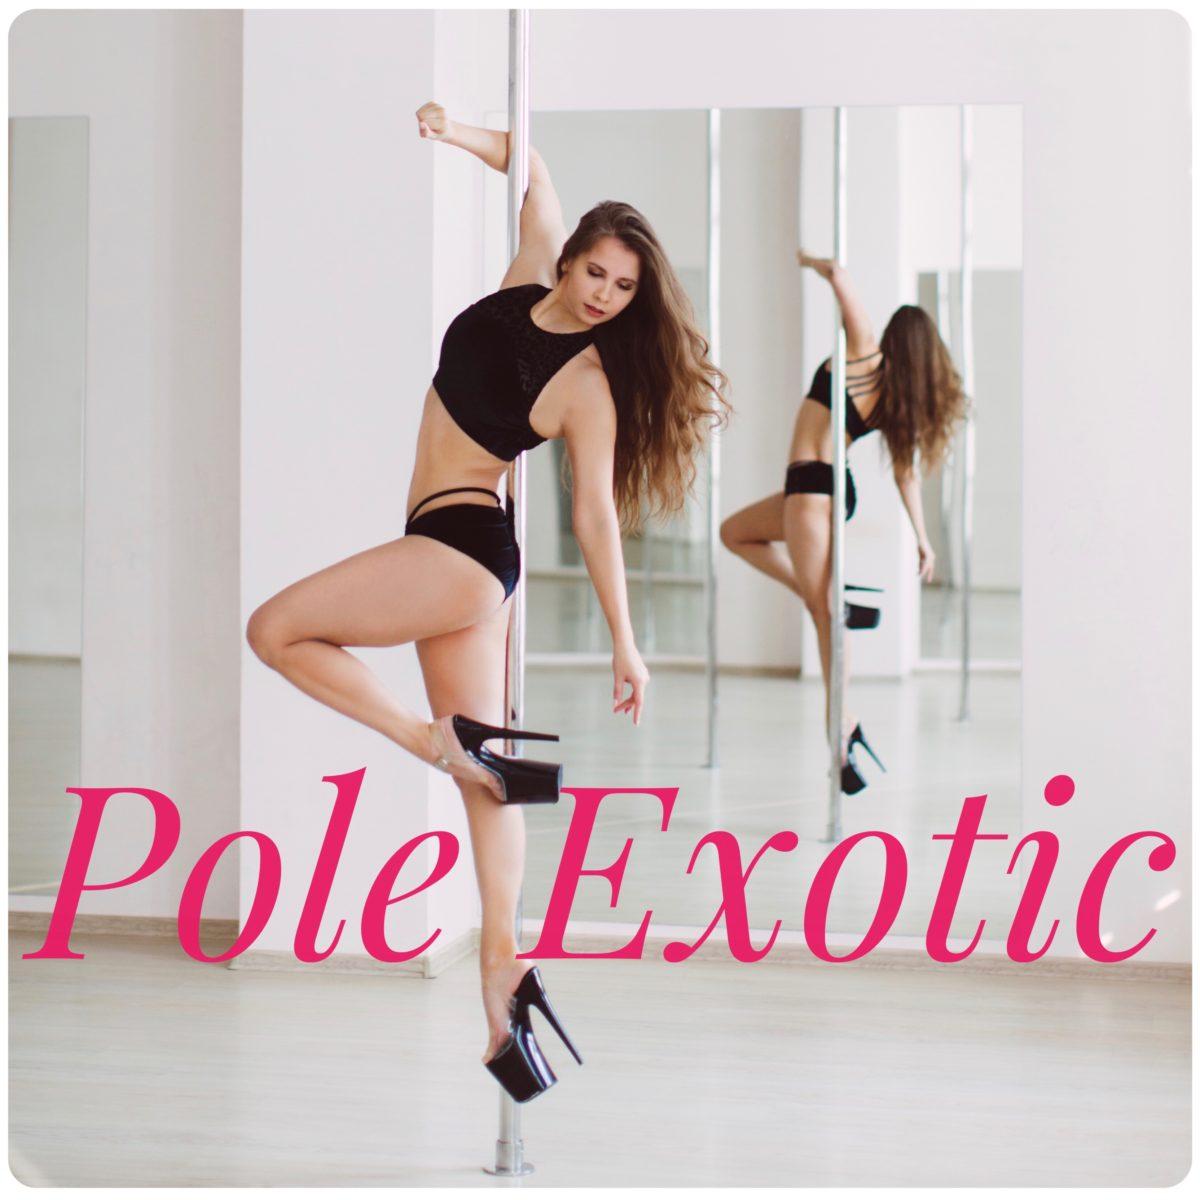 Pole Exotic